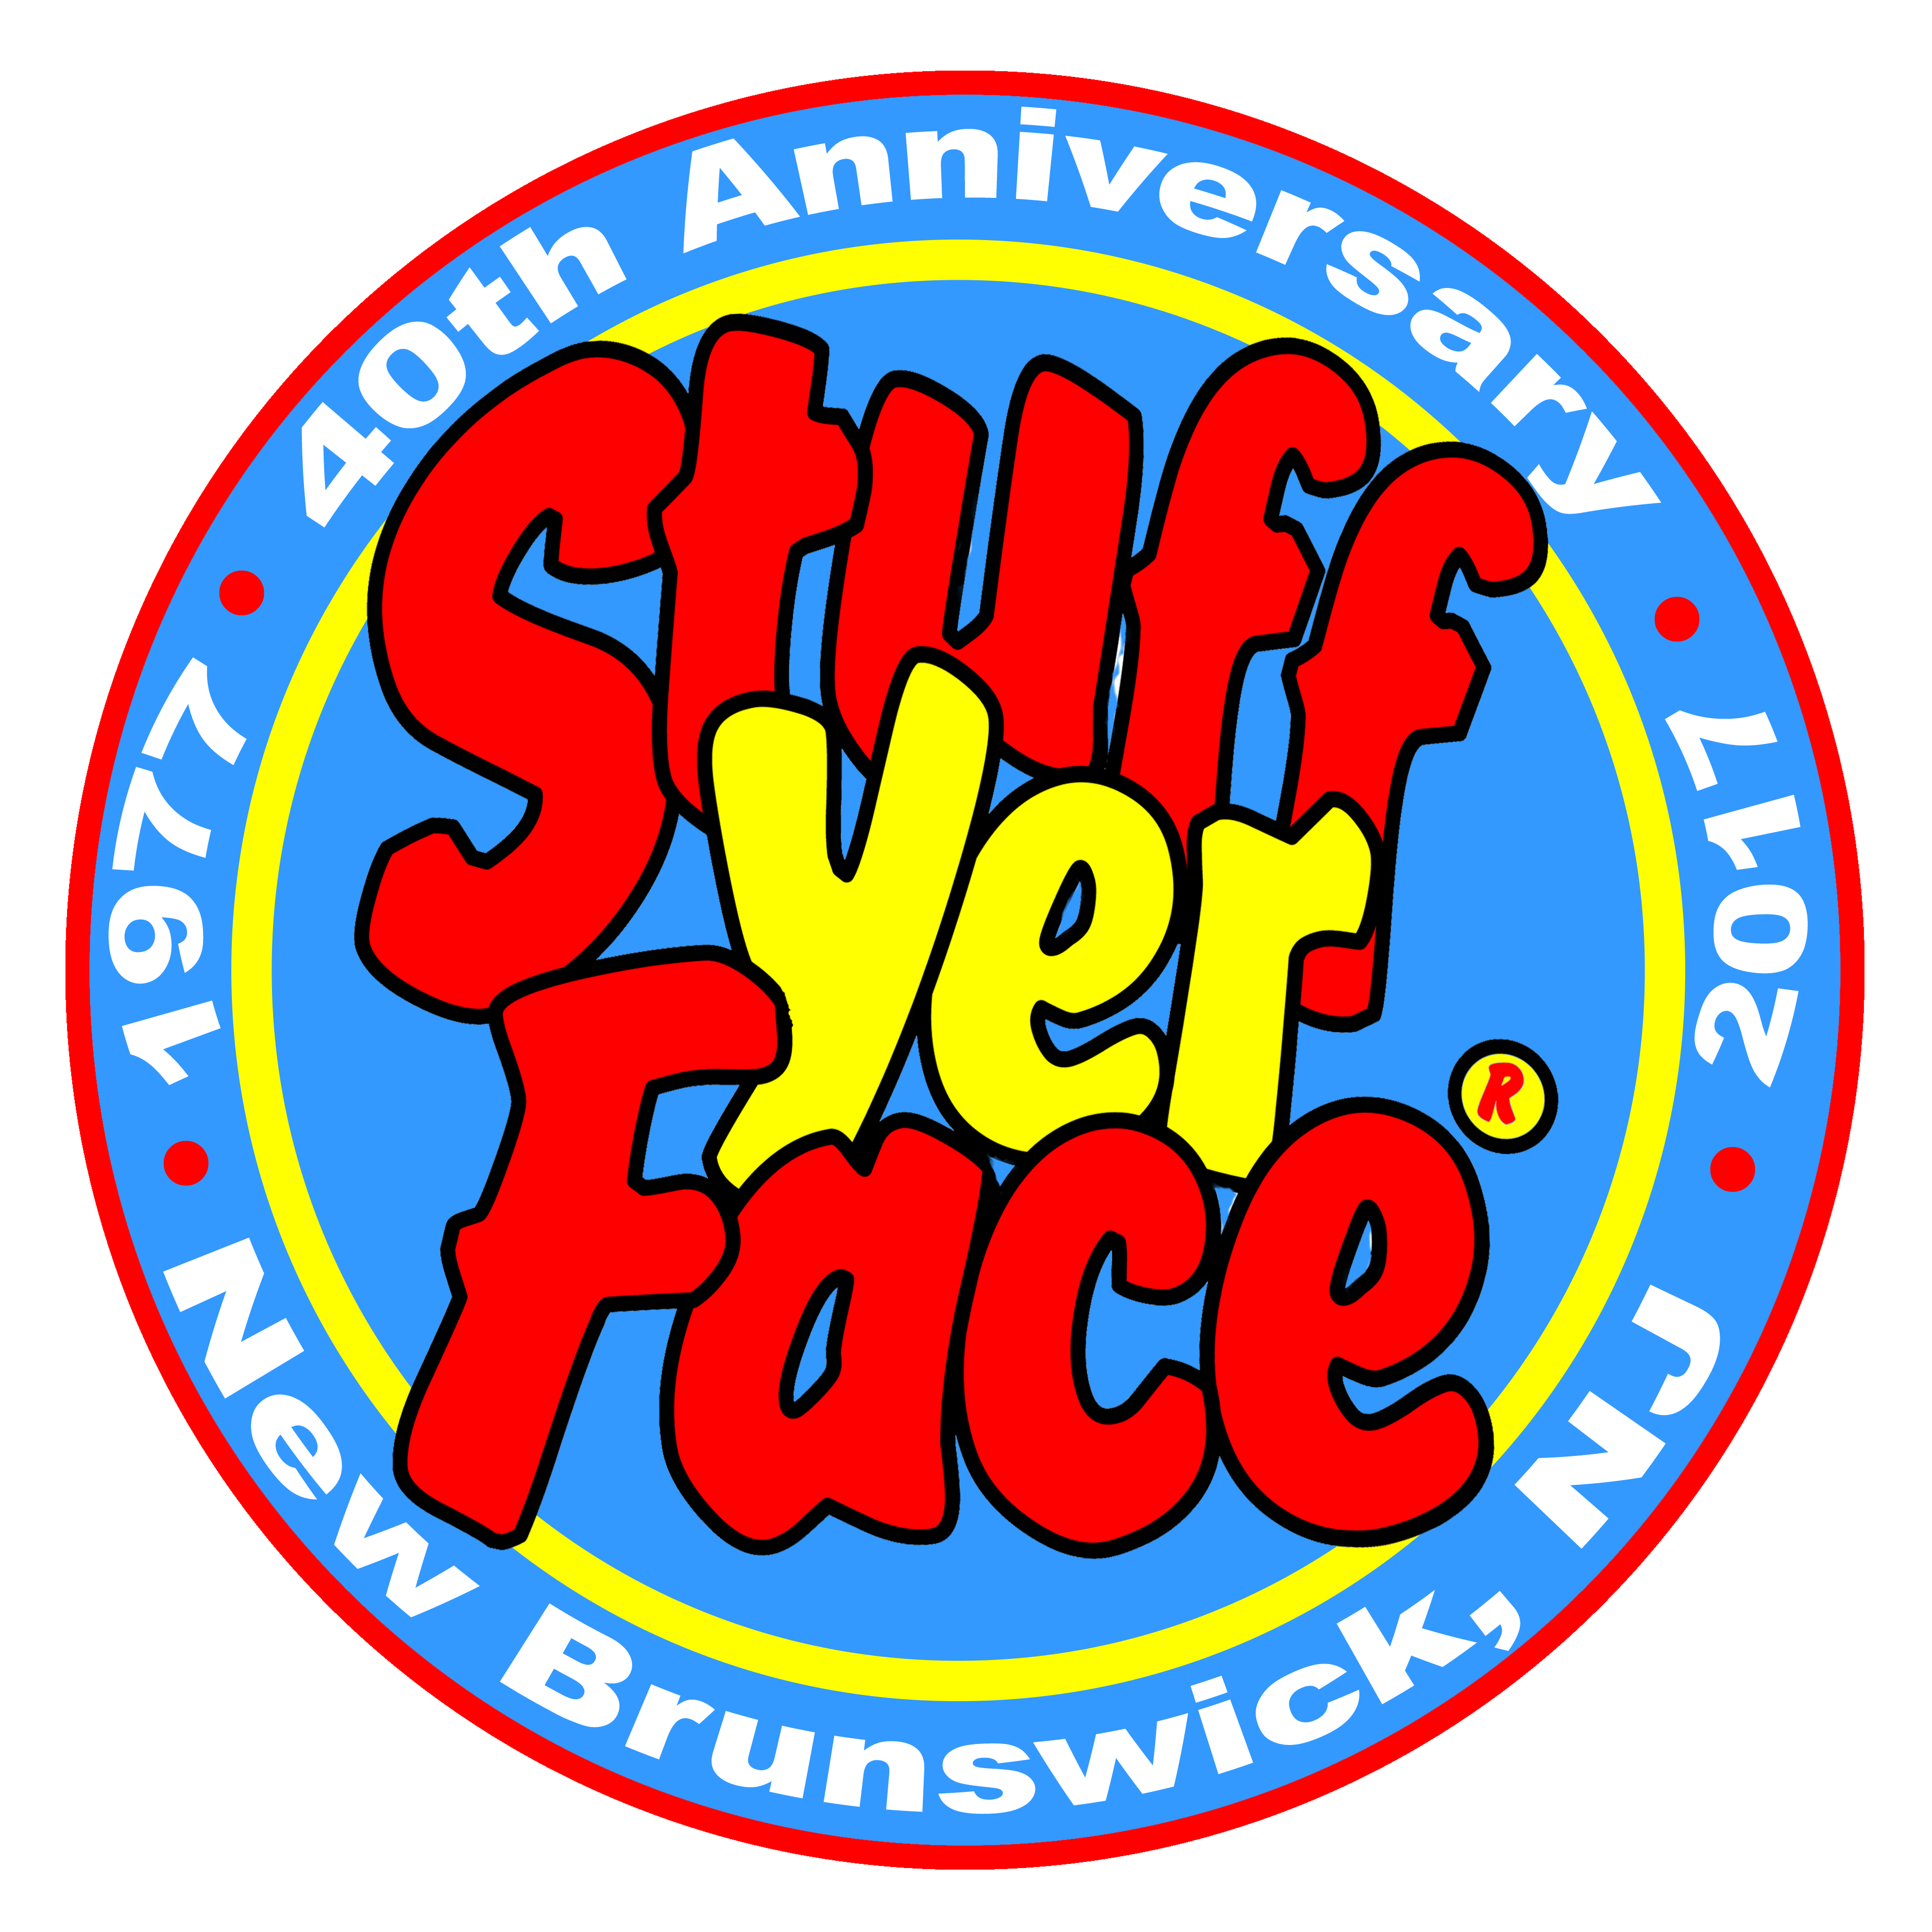 Stuff Yer Face